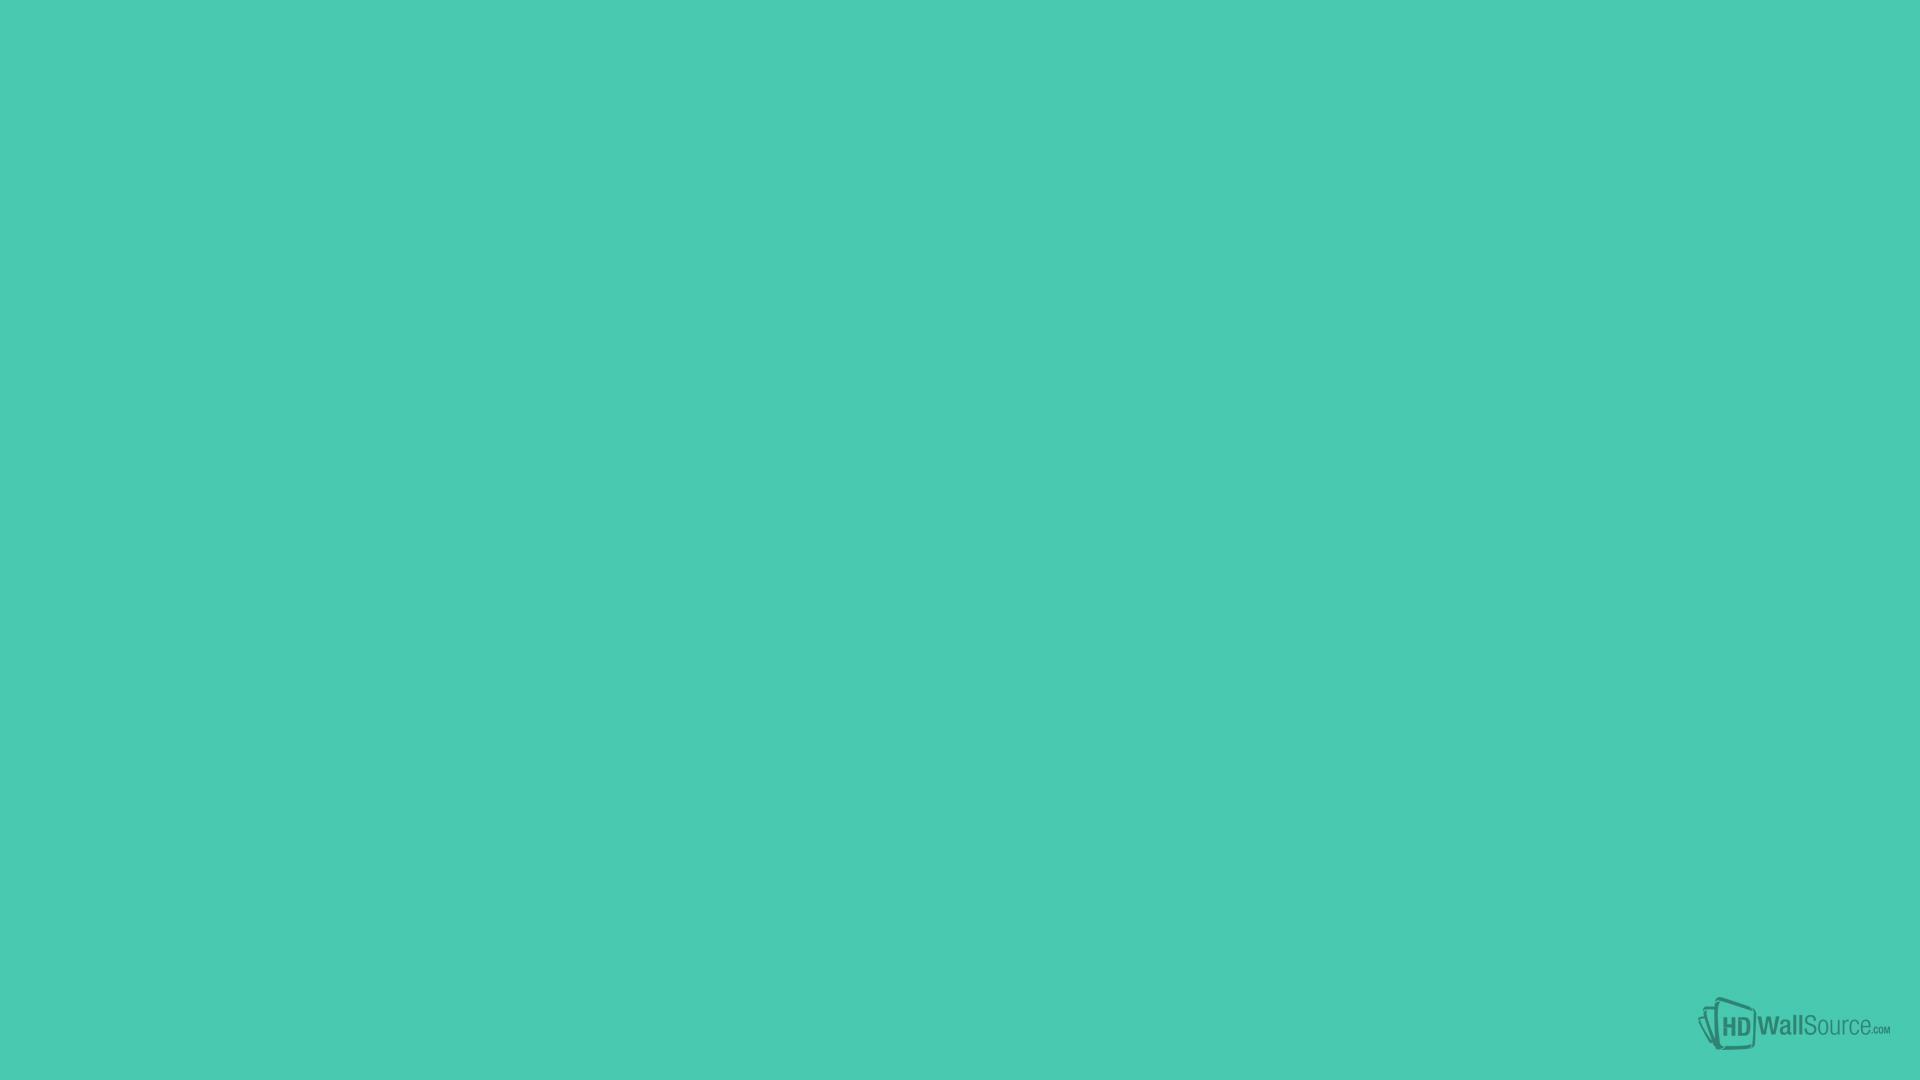 48c9b0 wallpaper 70795